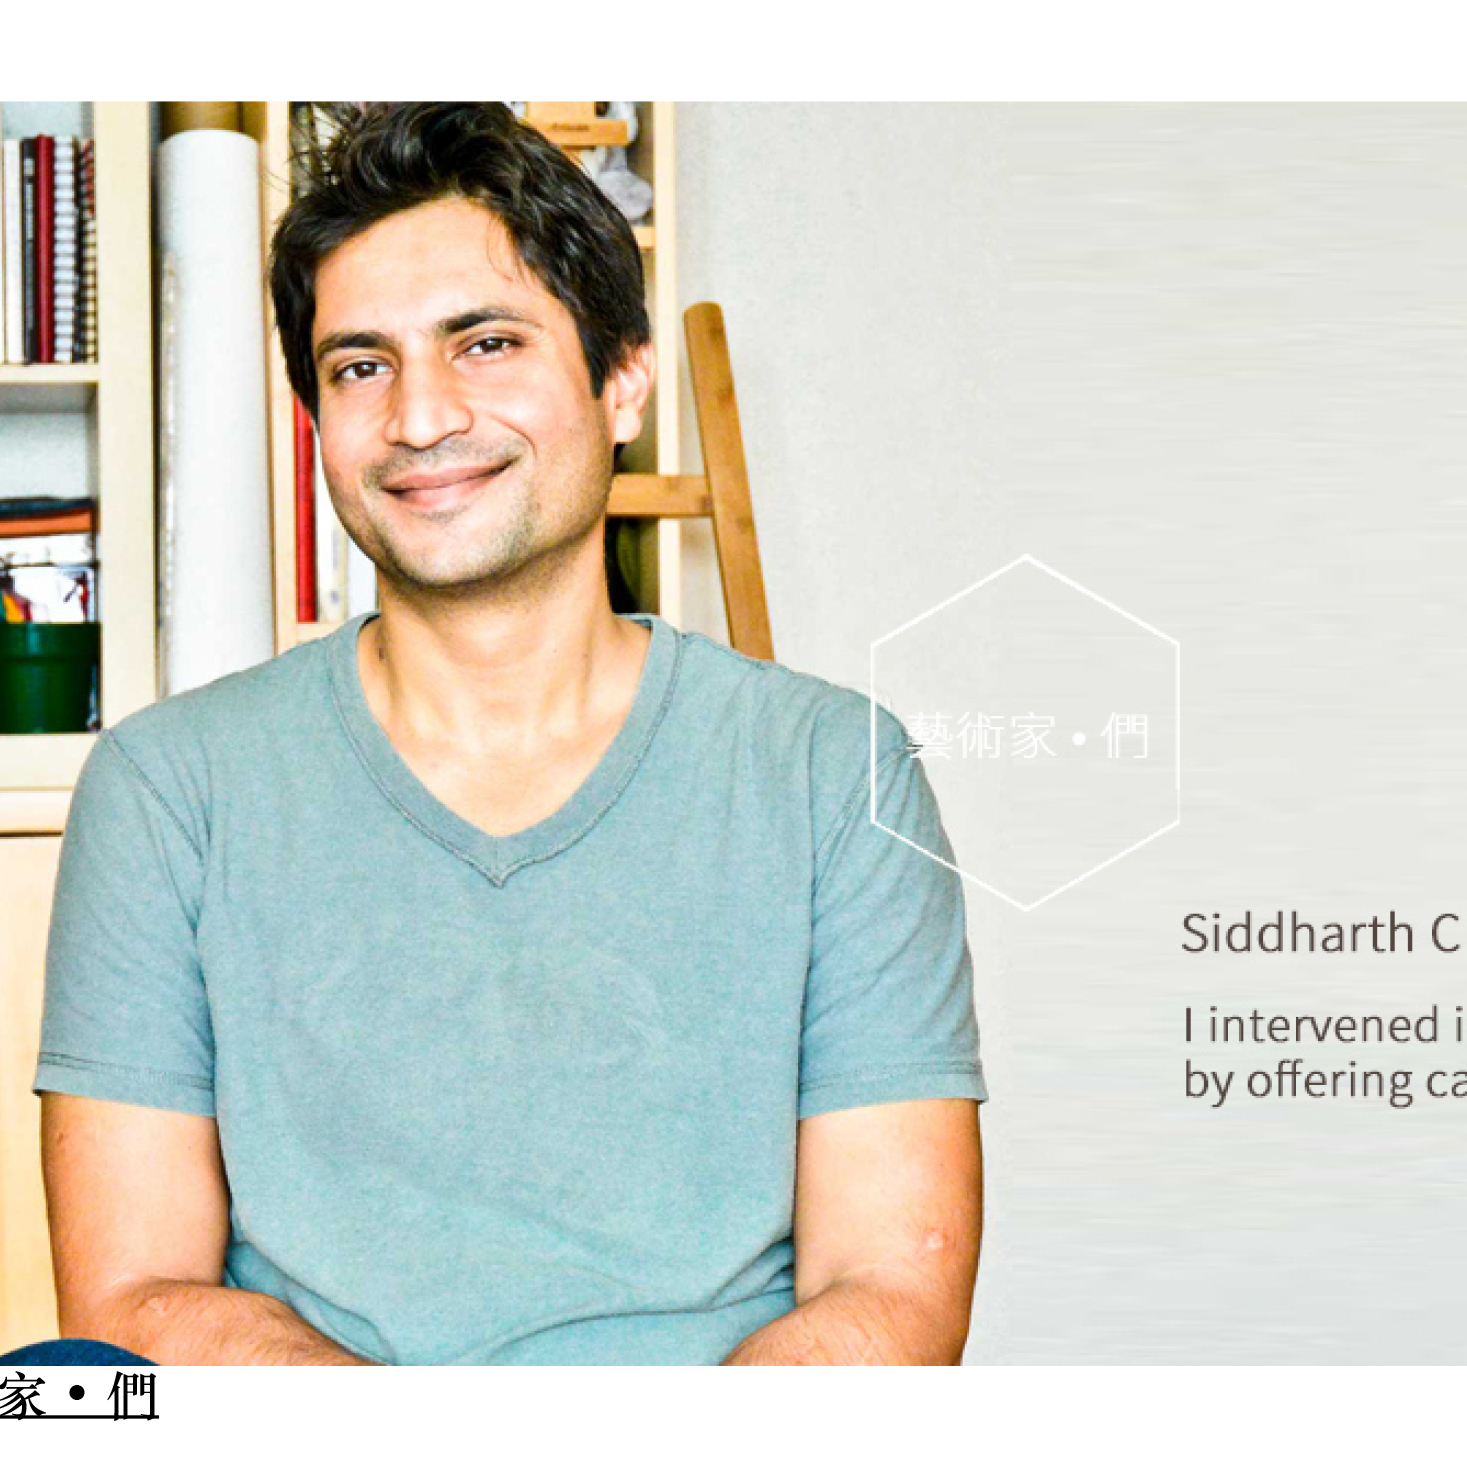 """They are artists: Siddharth Chou"